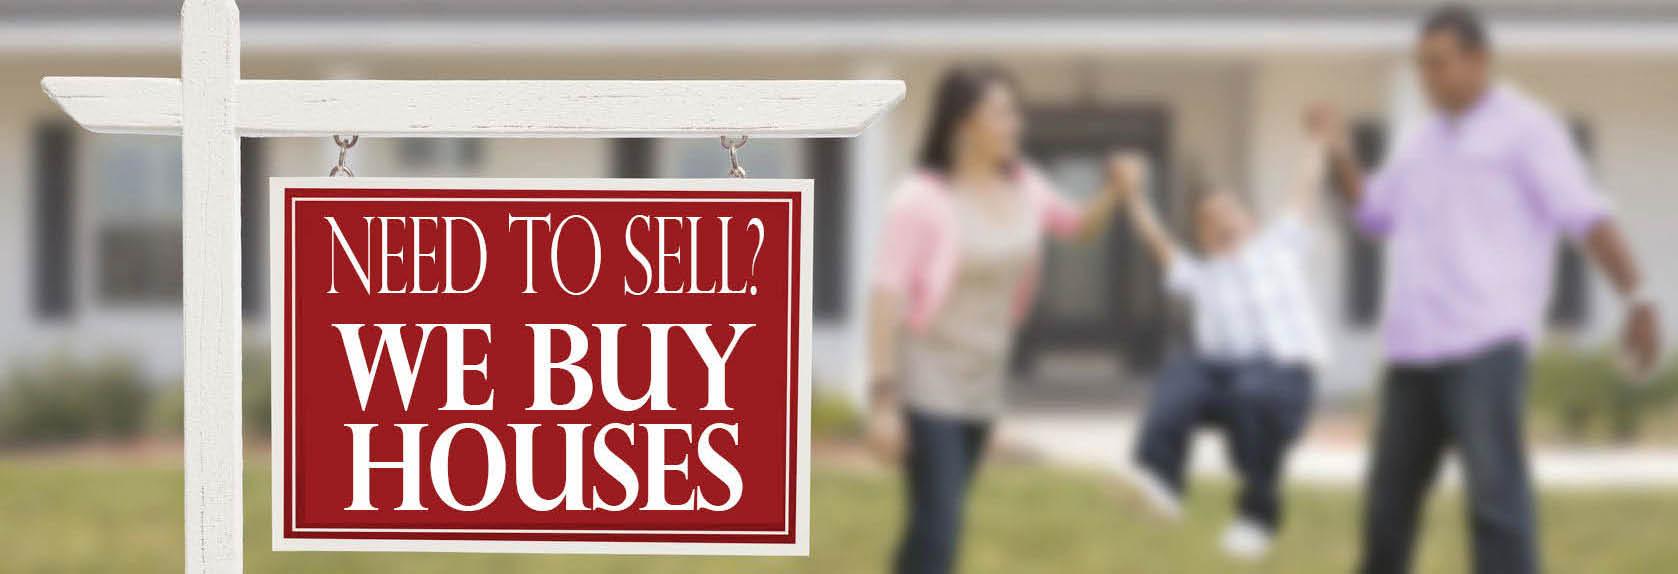 Sam Schwartz - We Buy Houses main banner image - Seatac, WA